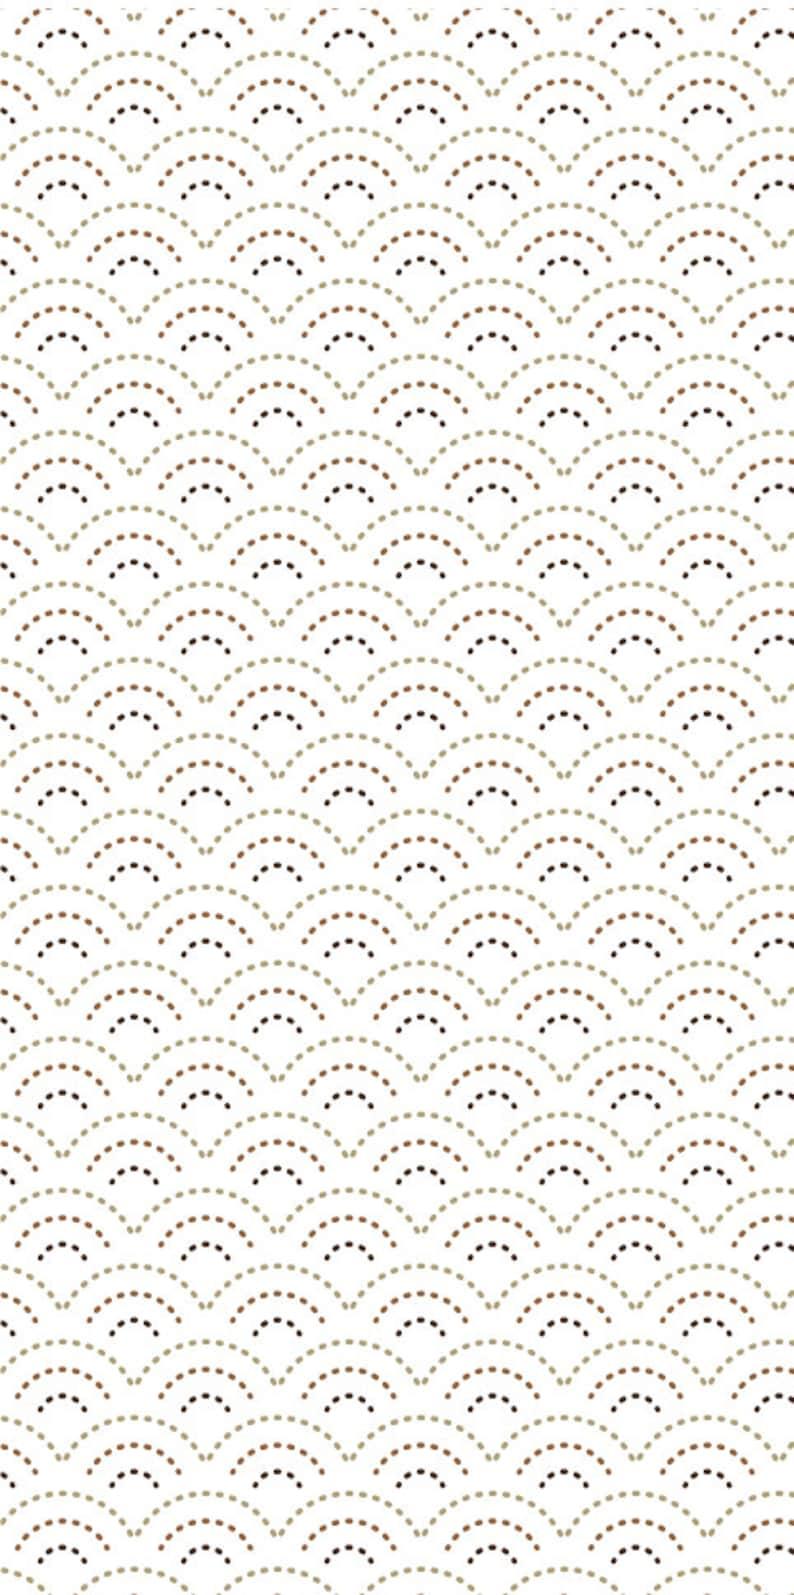 Japanese wallpaper Japanese print Peel and stick wallpaper Removable Wallpaper Self adhesive wallpaper wallpaper dots